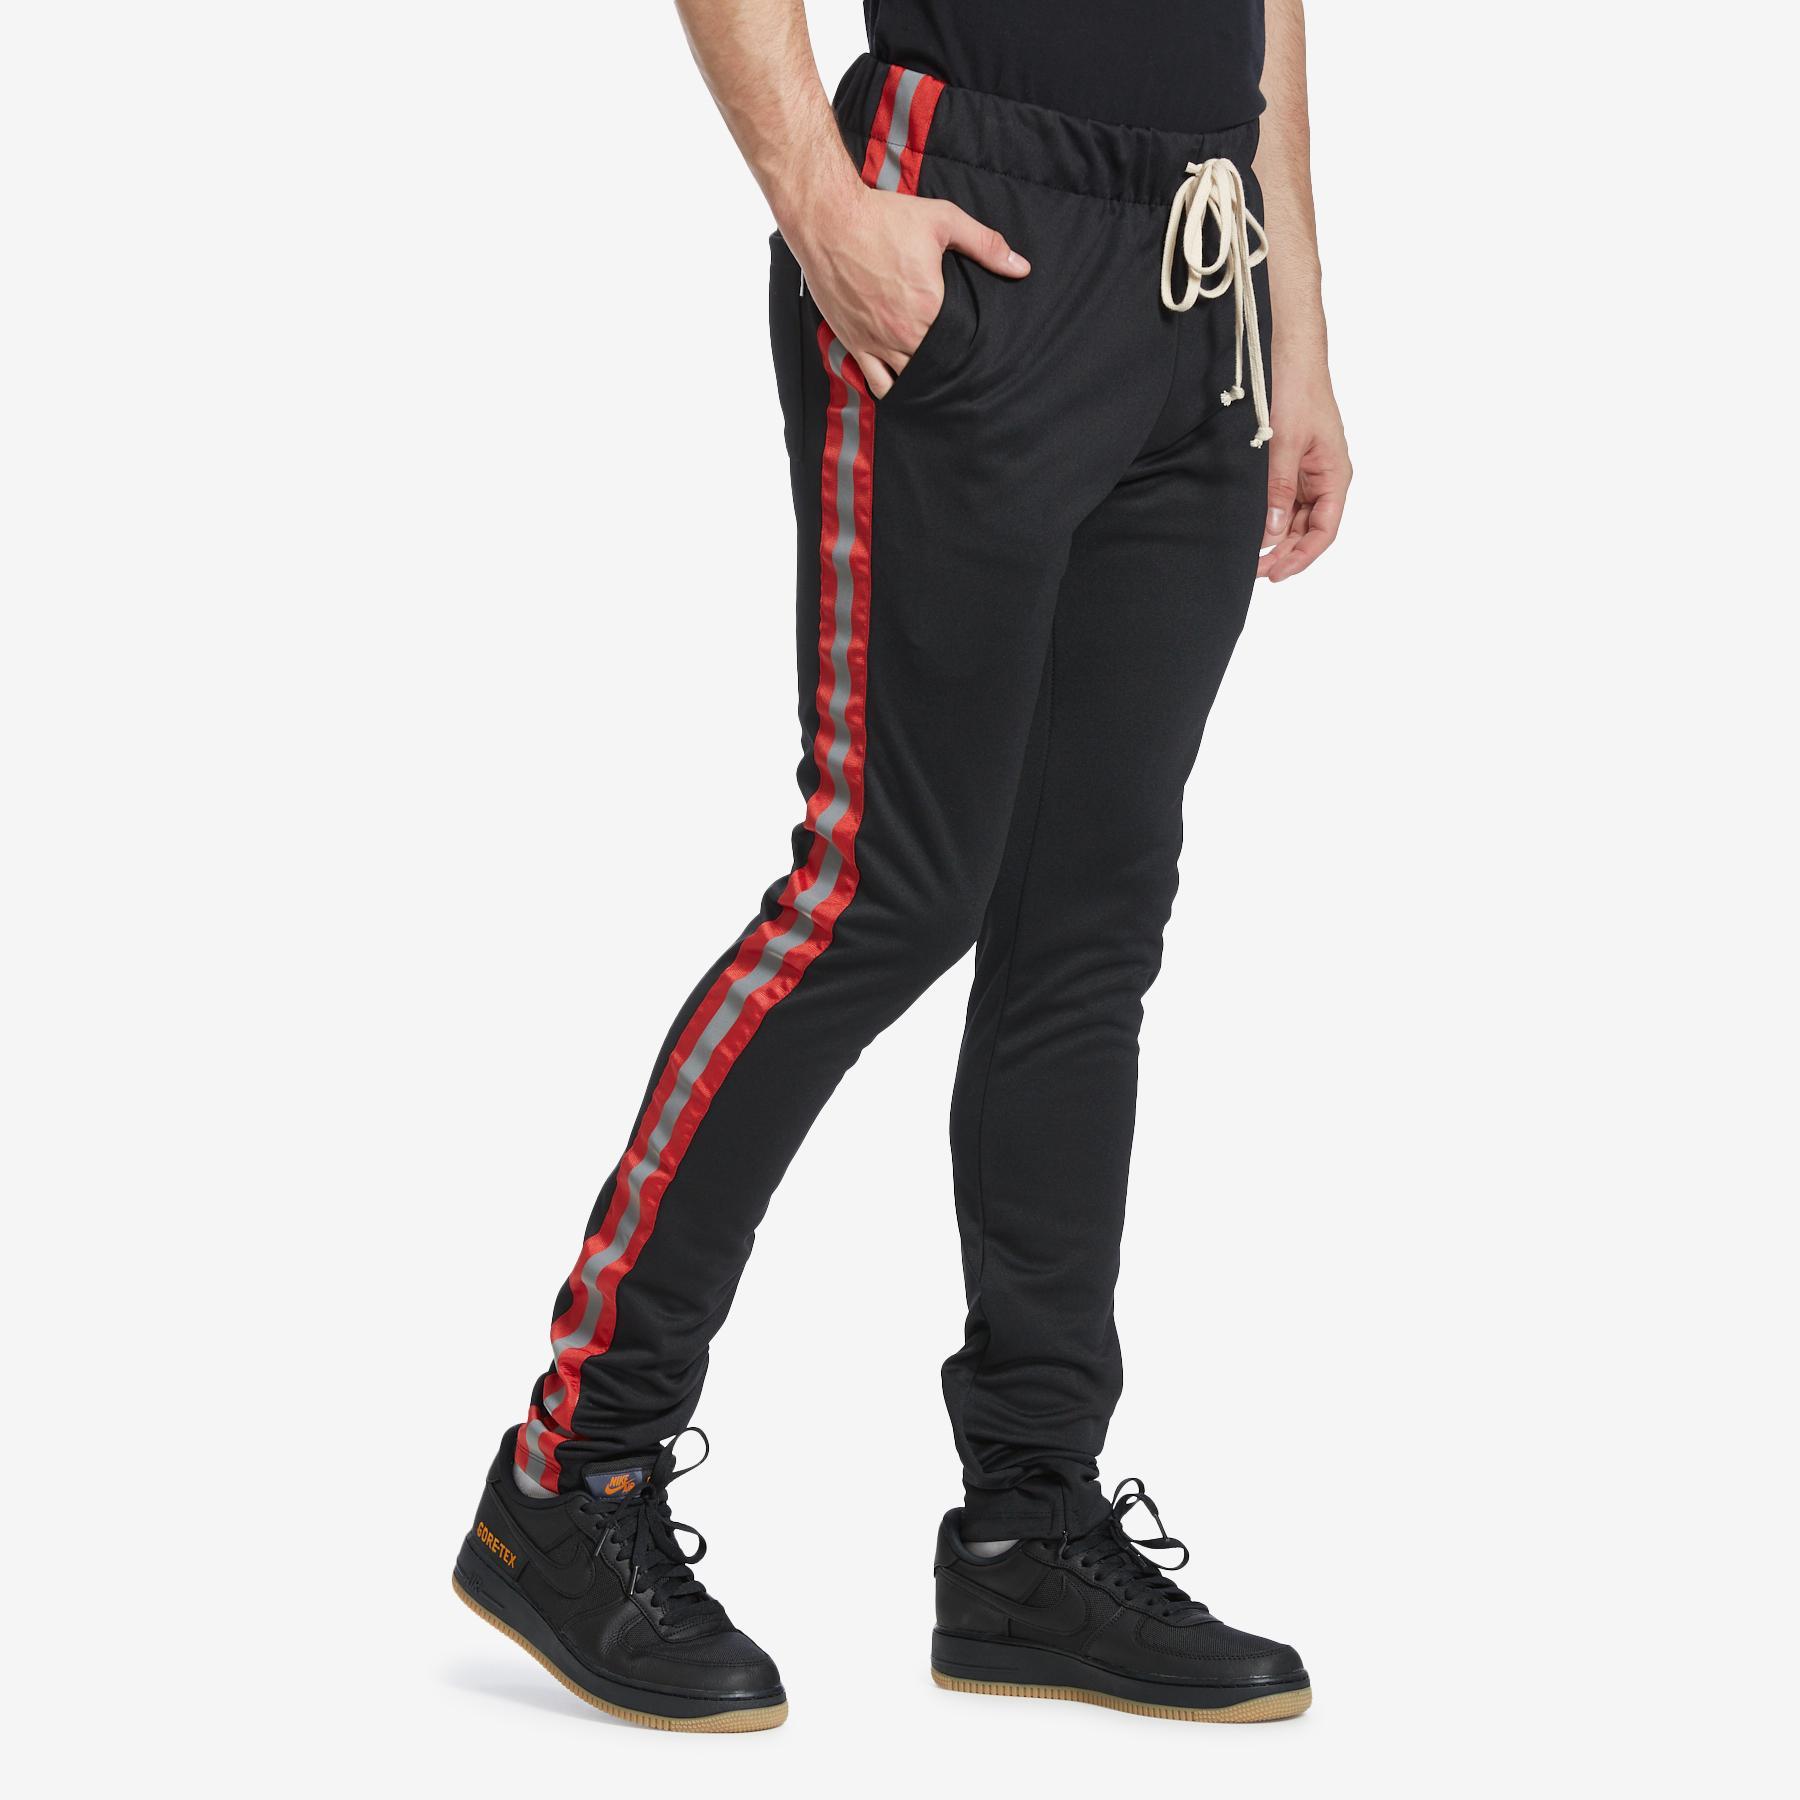 Men's Reflective Track Pants